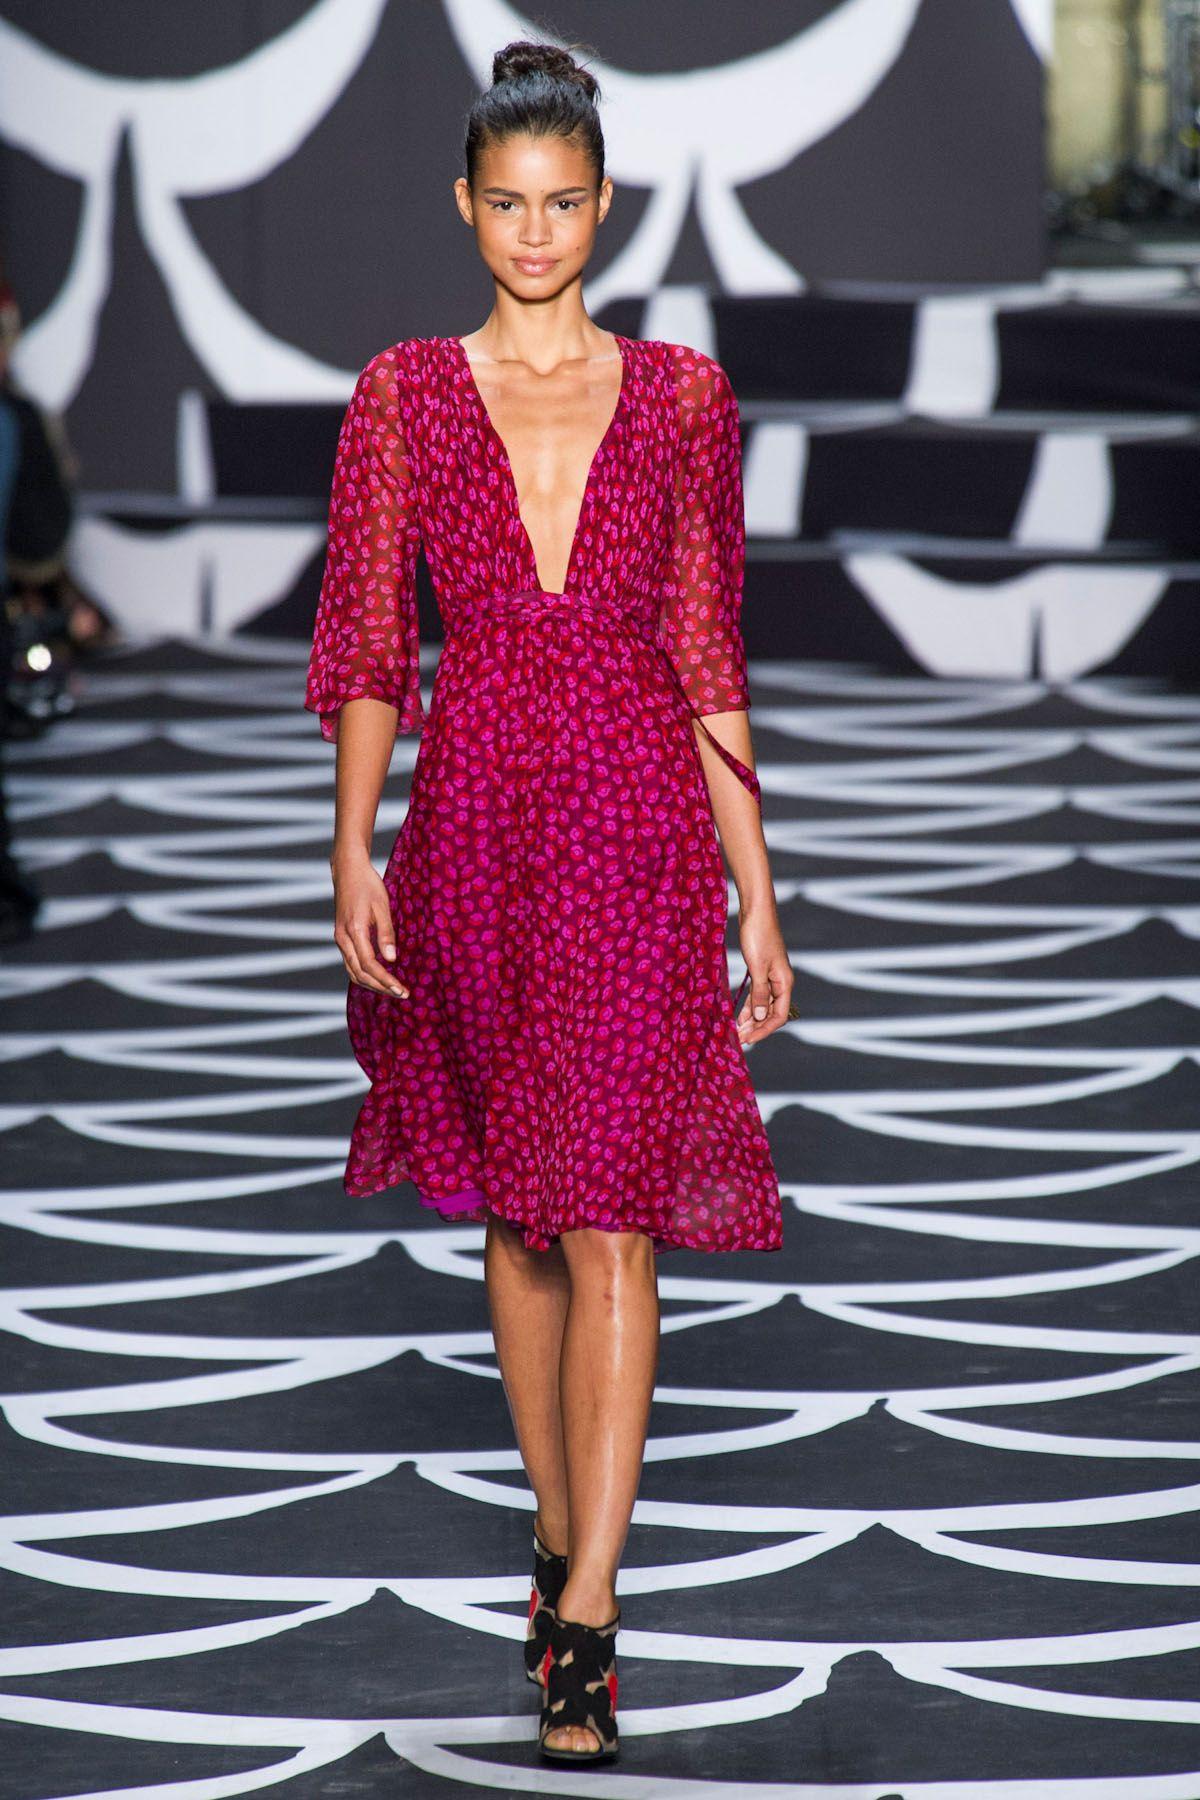 Diane von Furstenberg | Nova York | Inverno 2014 RTW